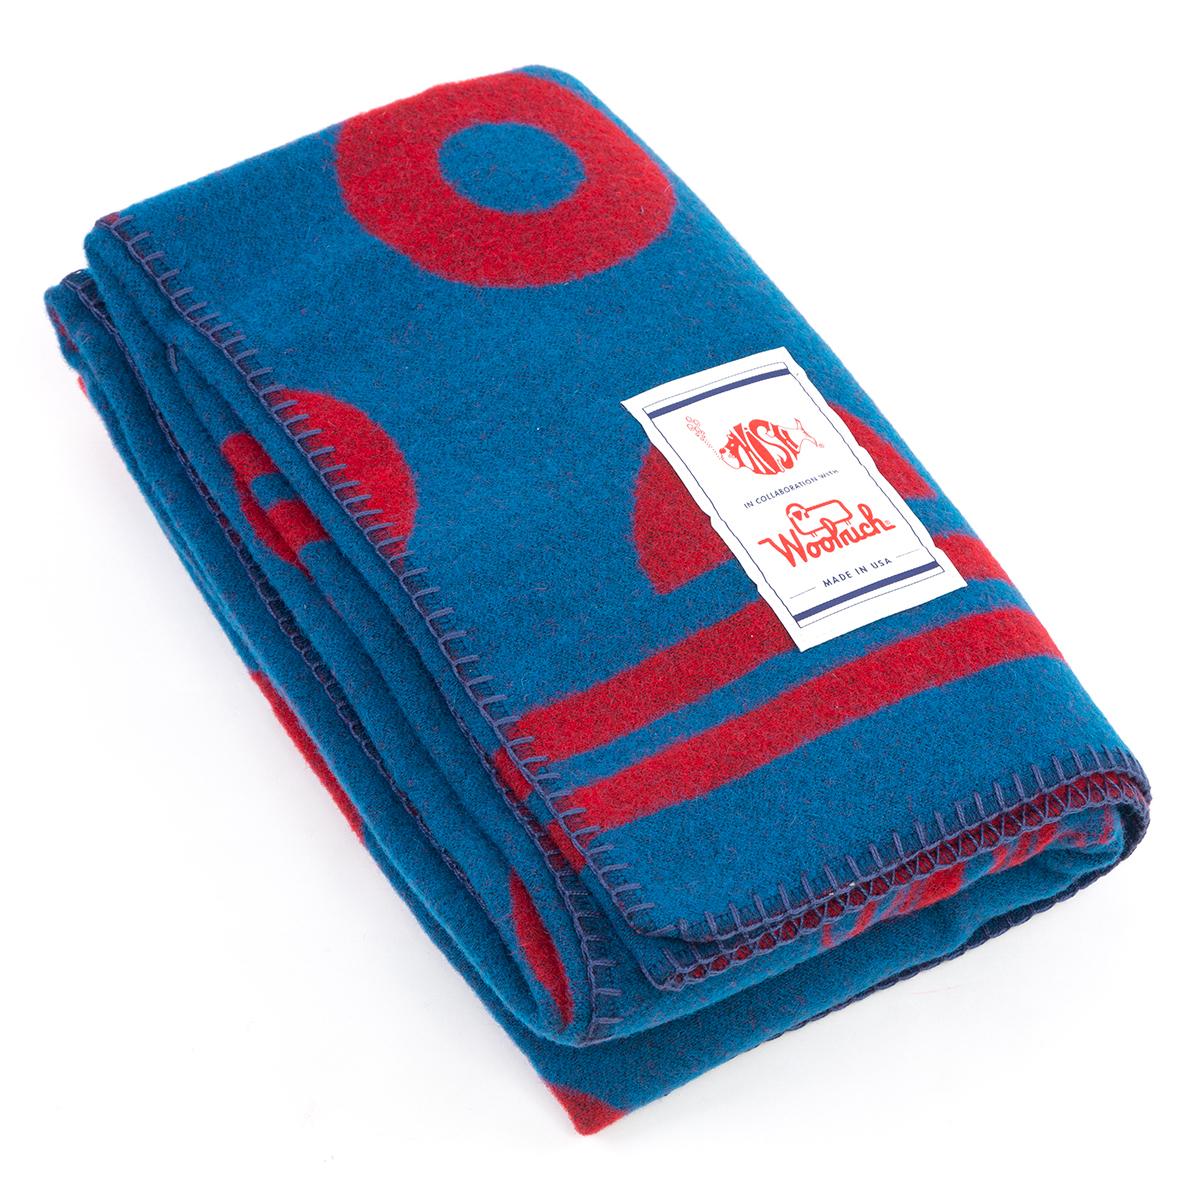 Phish x Woolrich Fishman Wool Blanket